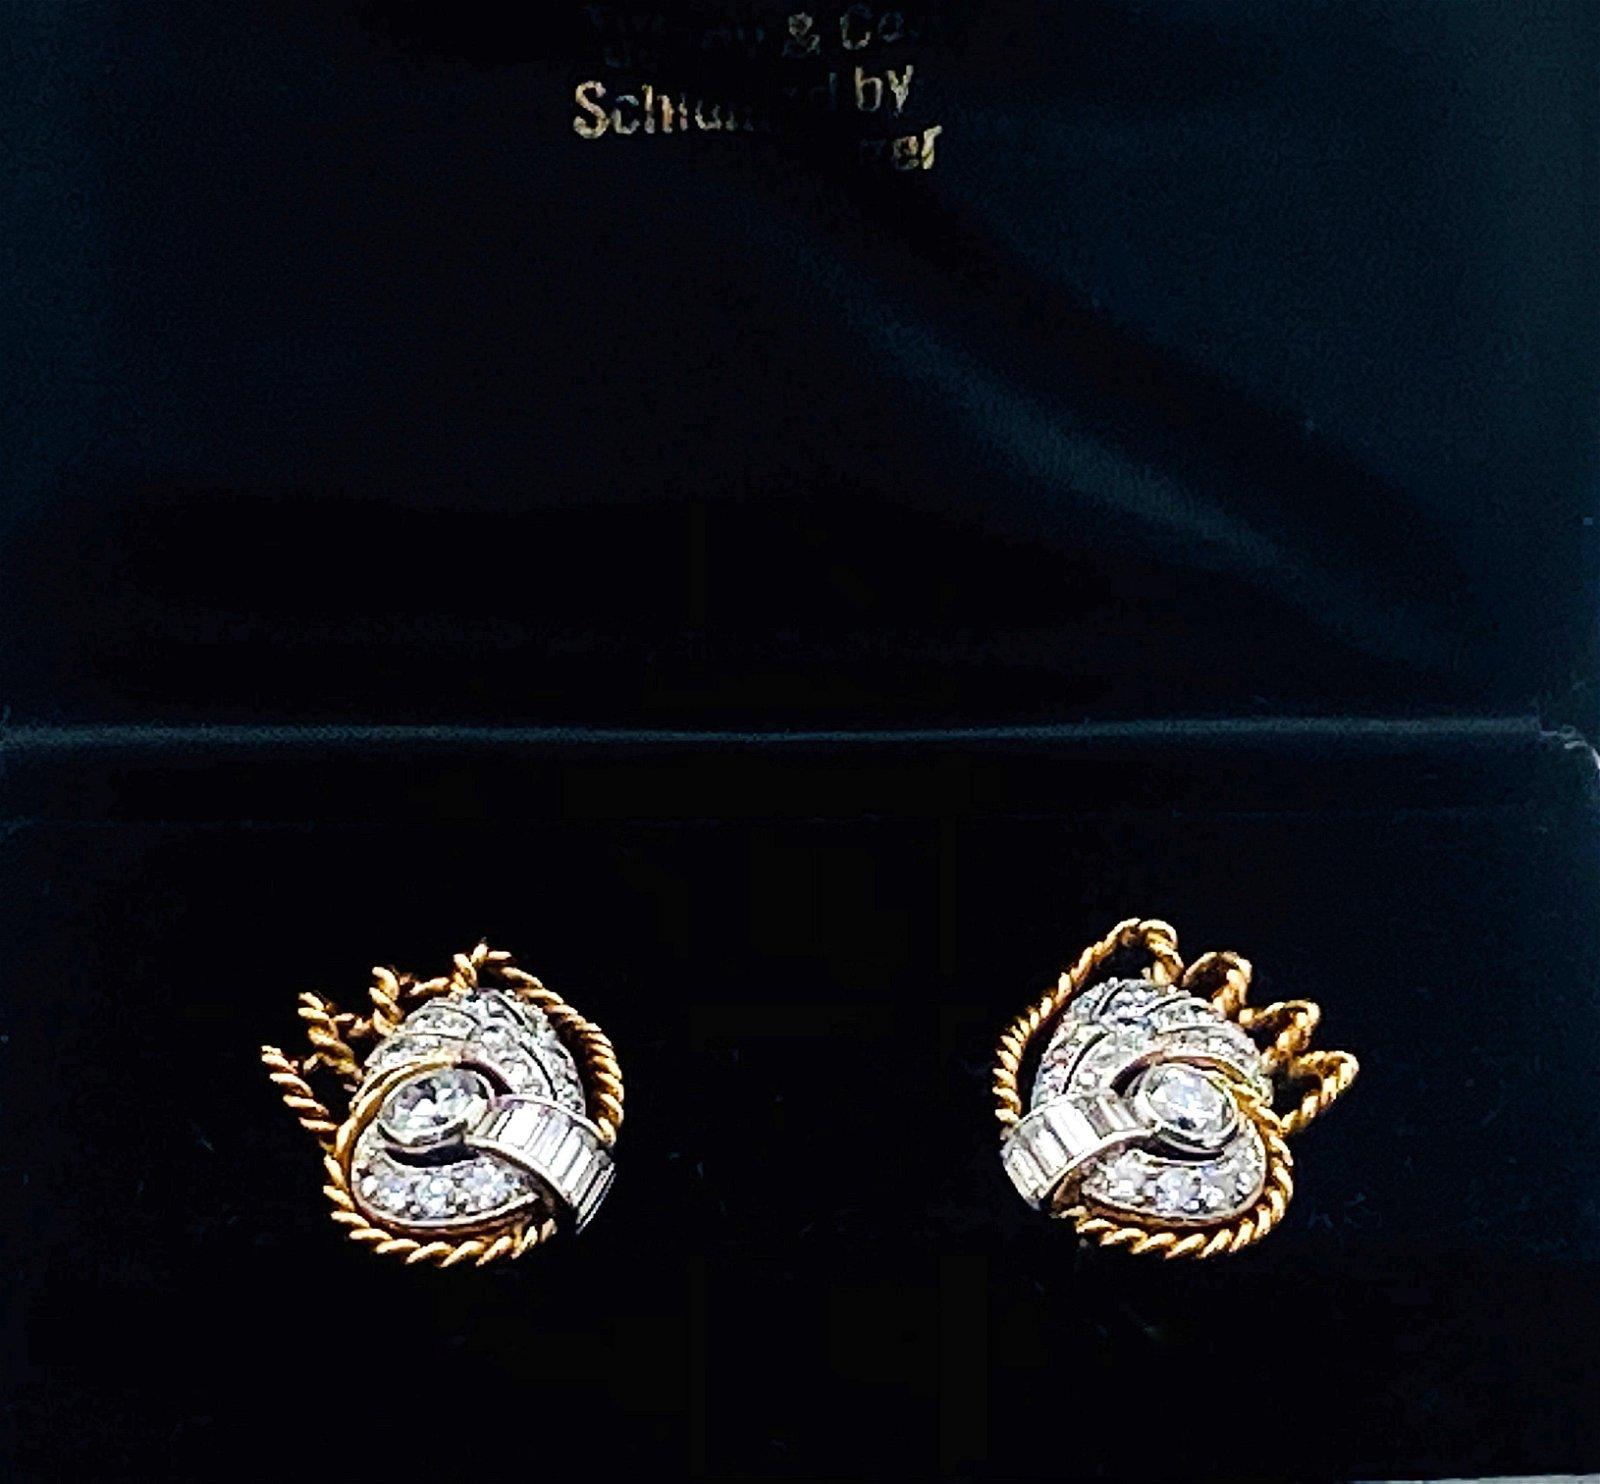 TIFFANY & CO 18K YELLOW GOLD PLATINUM EARRINGS